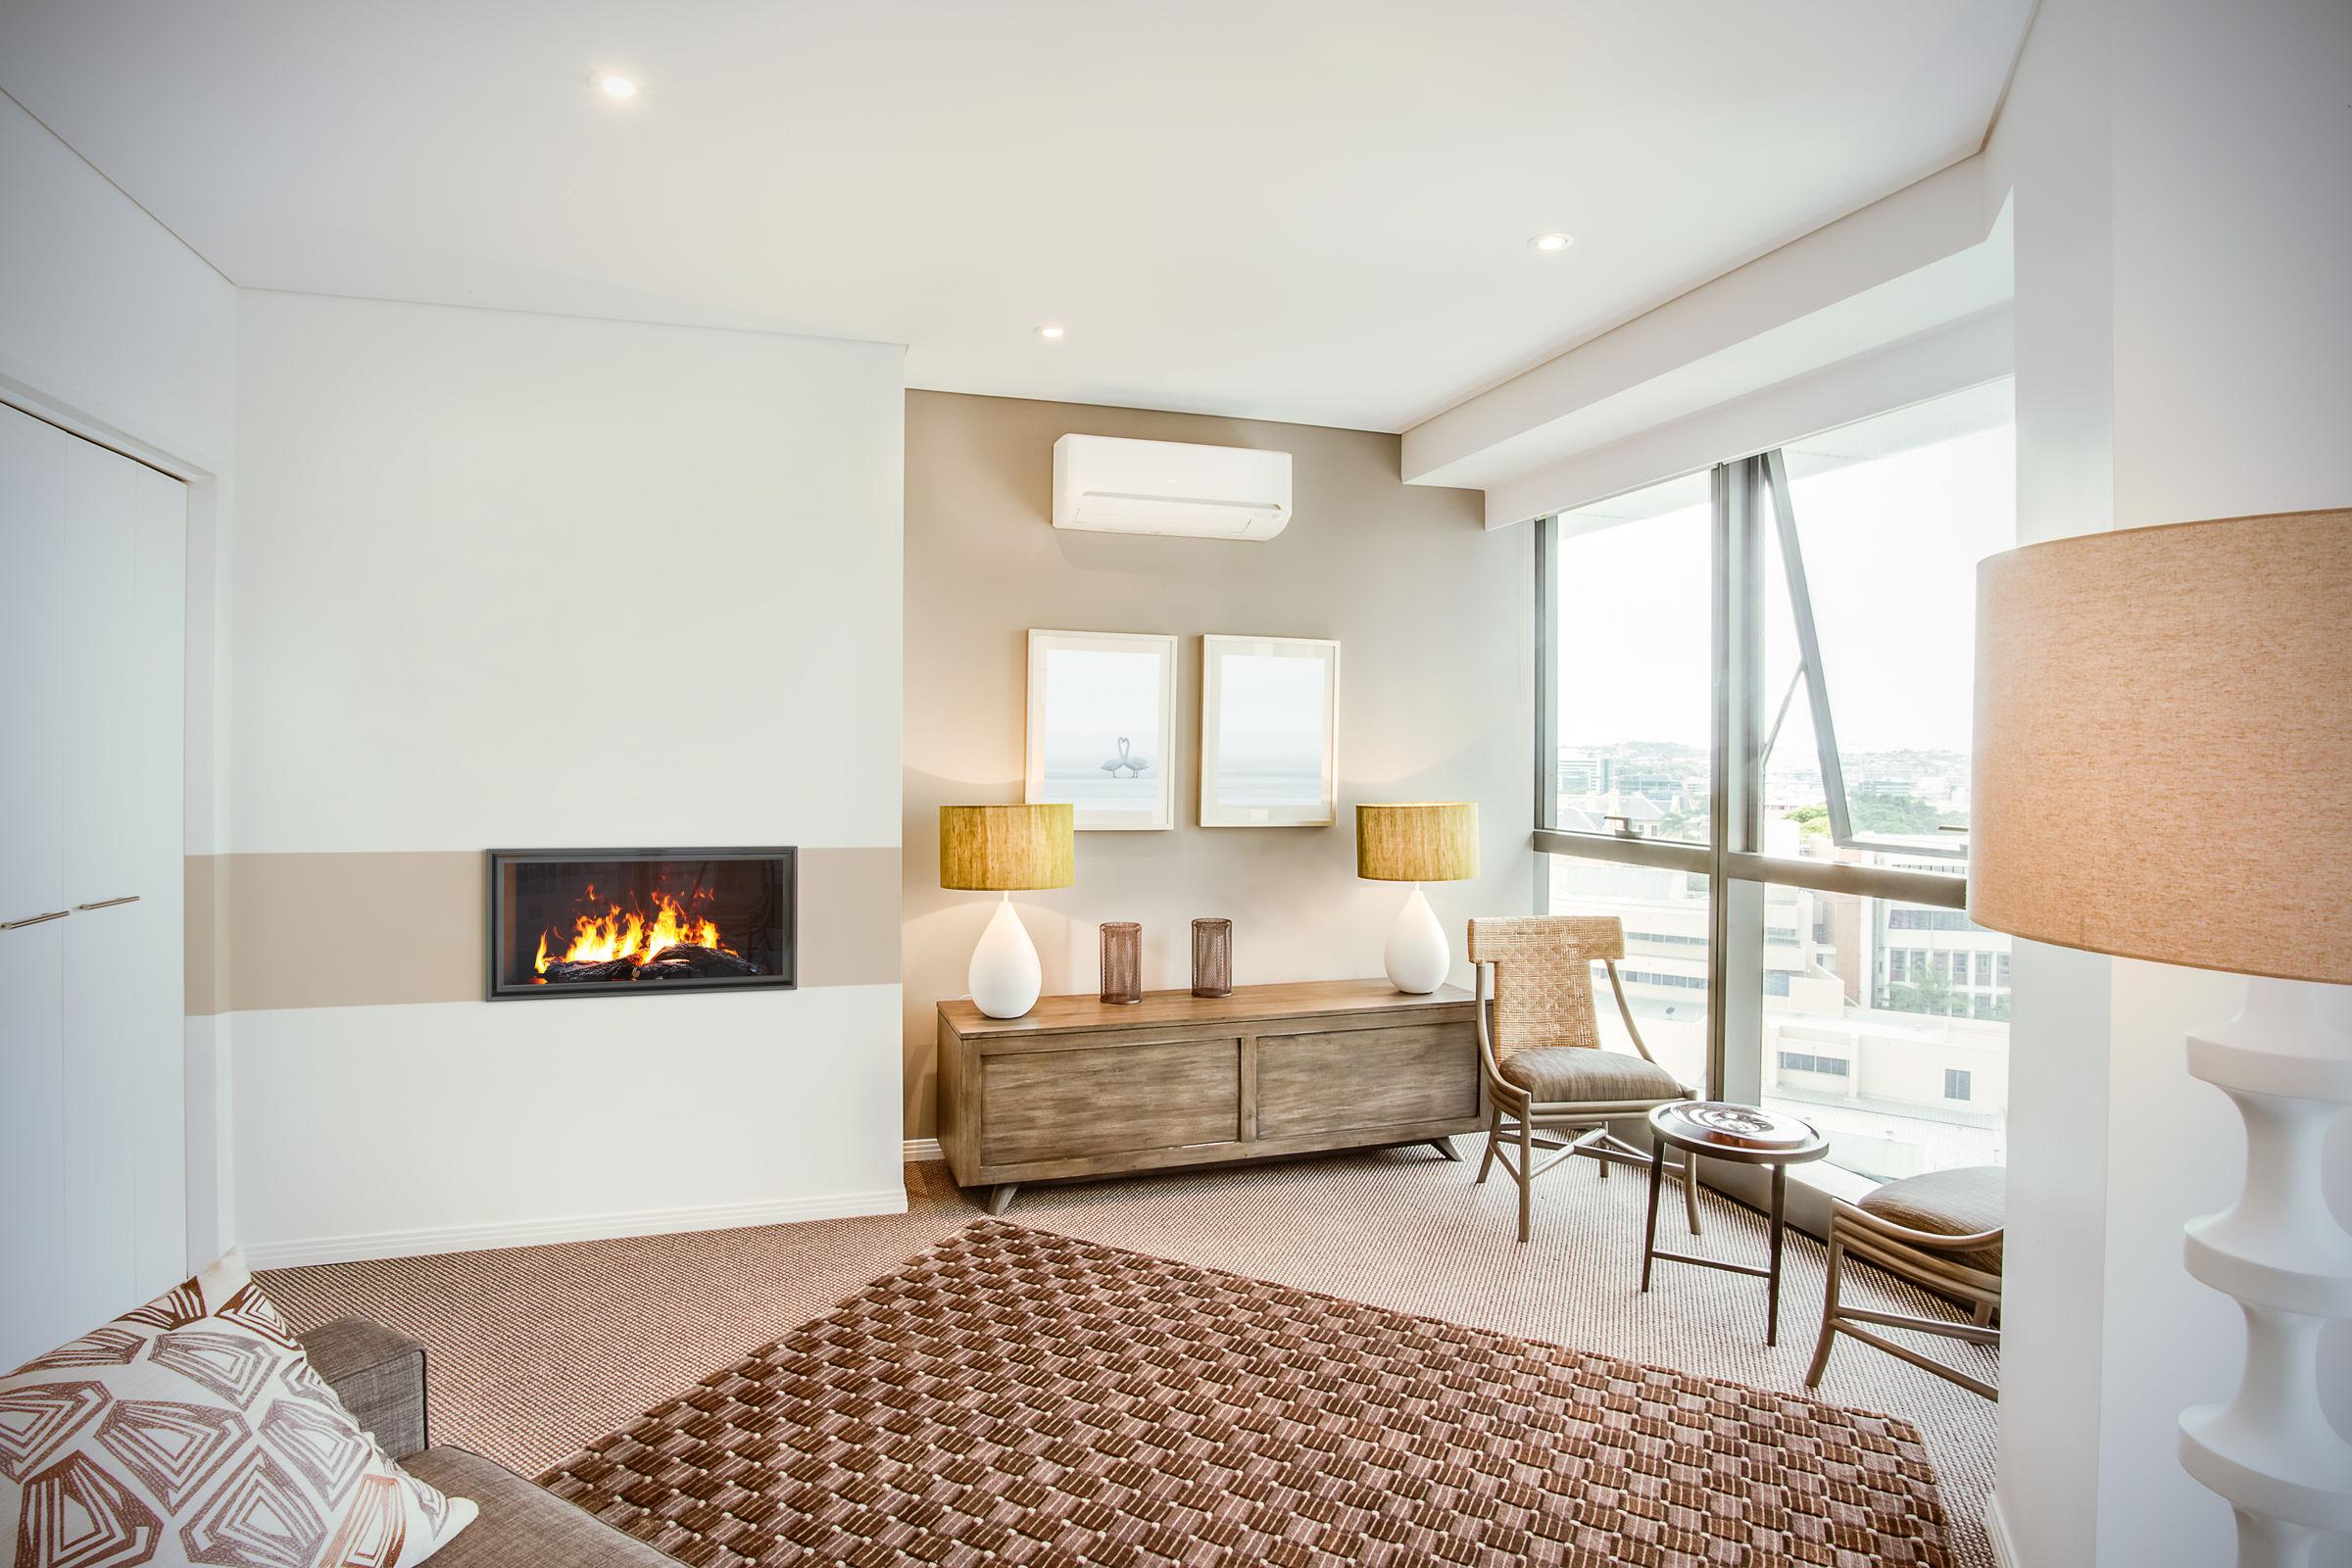 36 Inch Single-Sided | Built-In Linear Vapor-Fire Fireplace